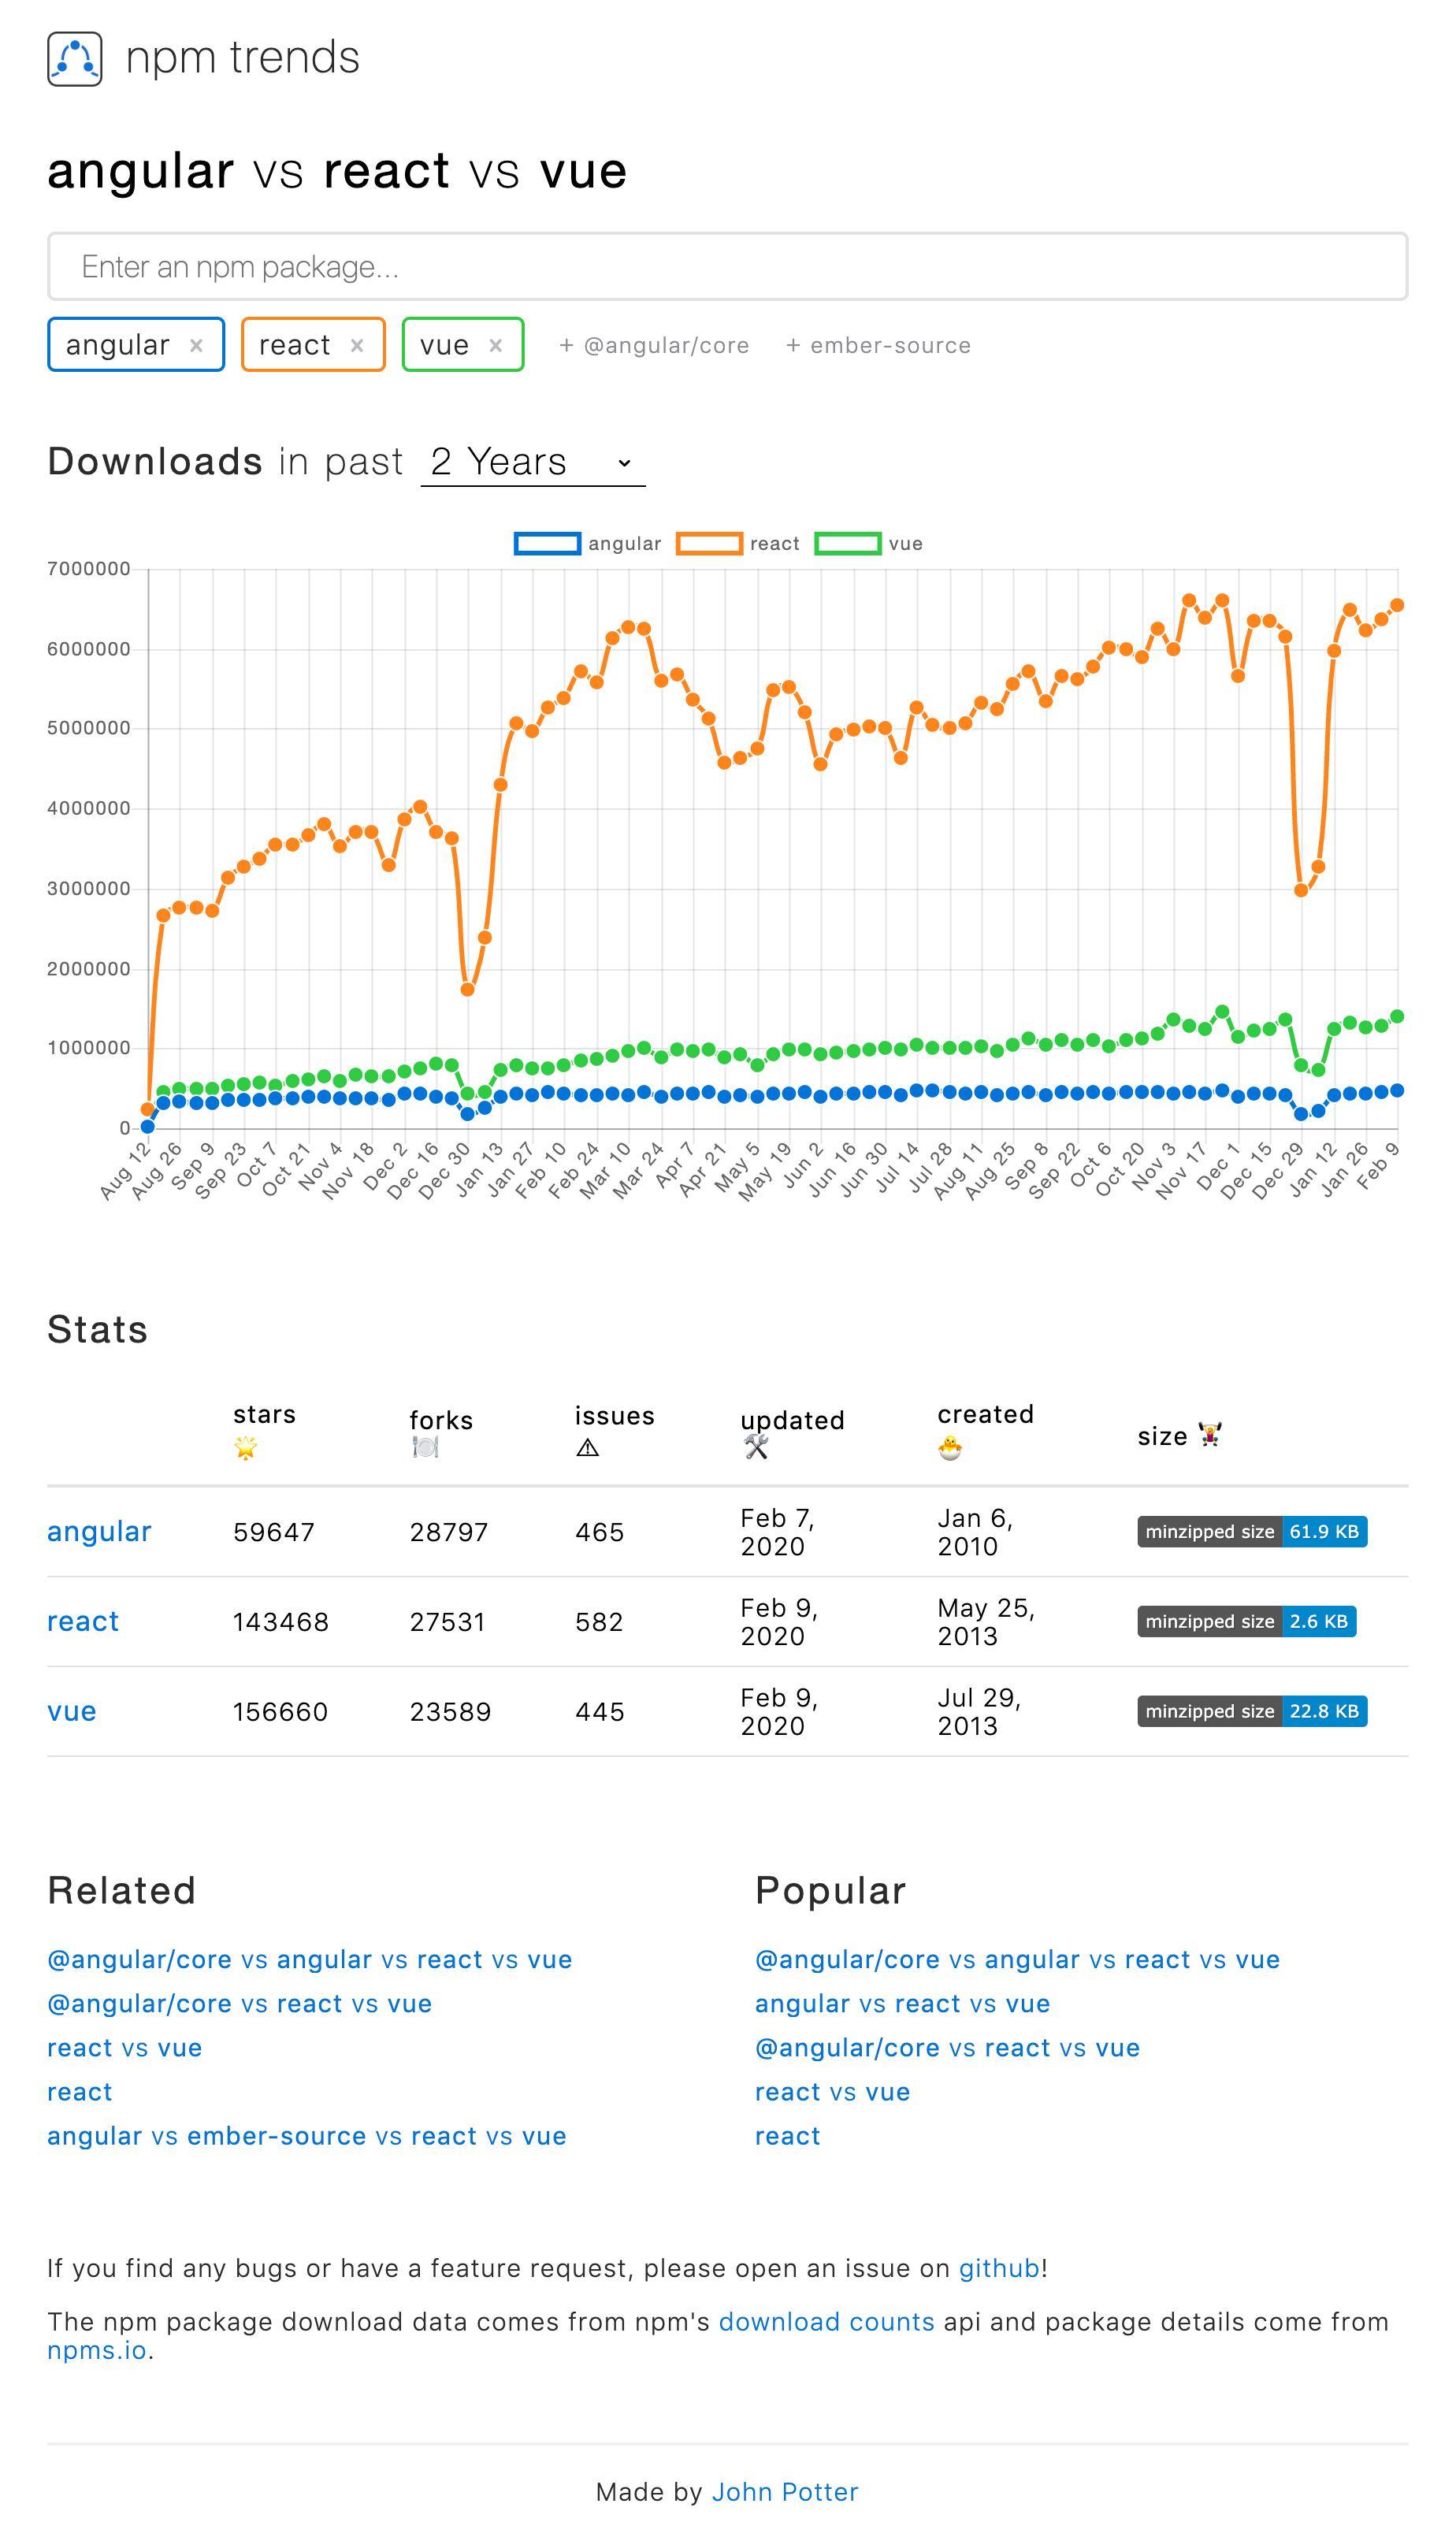 www.npmtrends.com_angular-vs-react-vs-vue.png